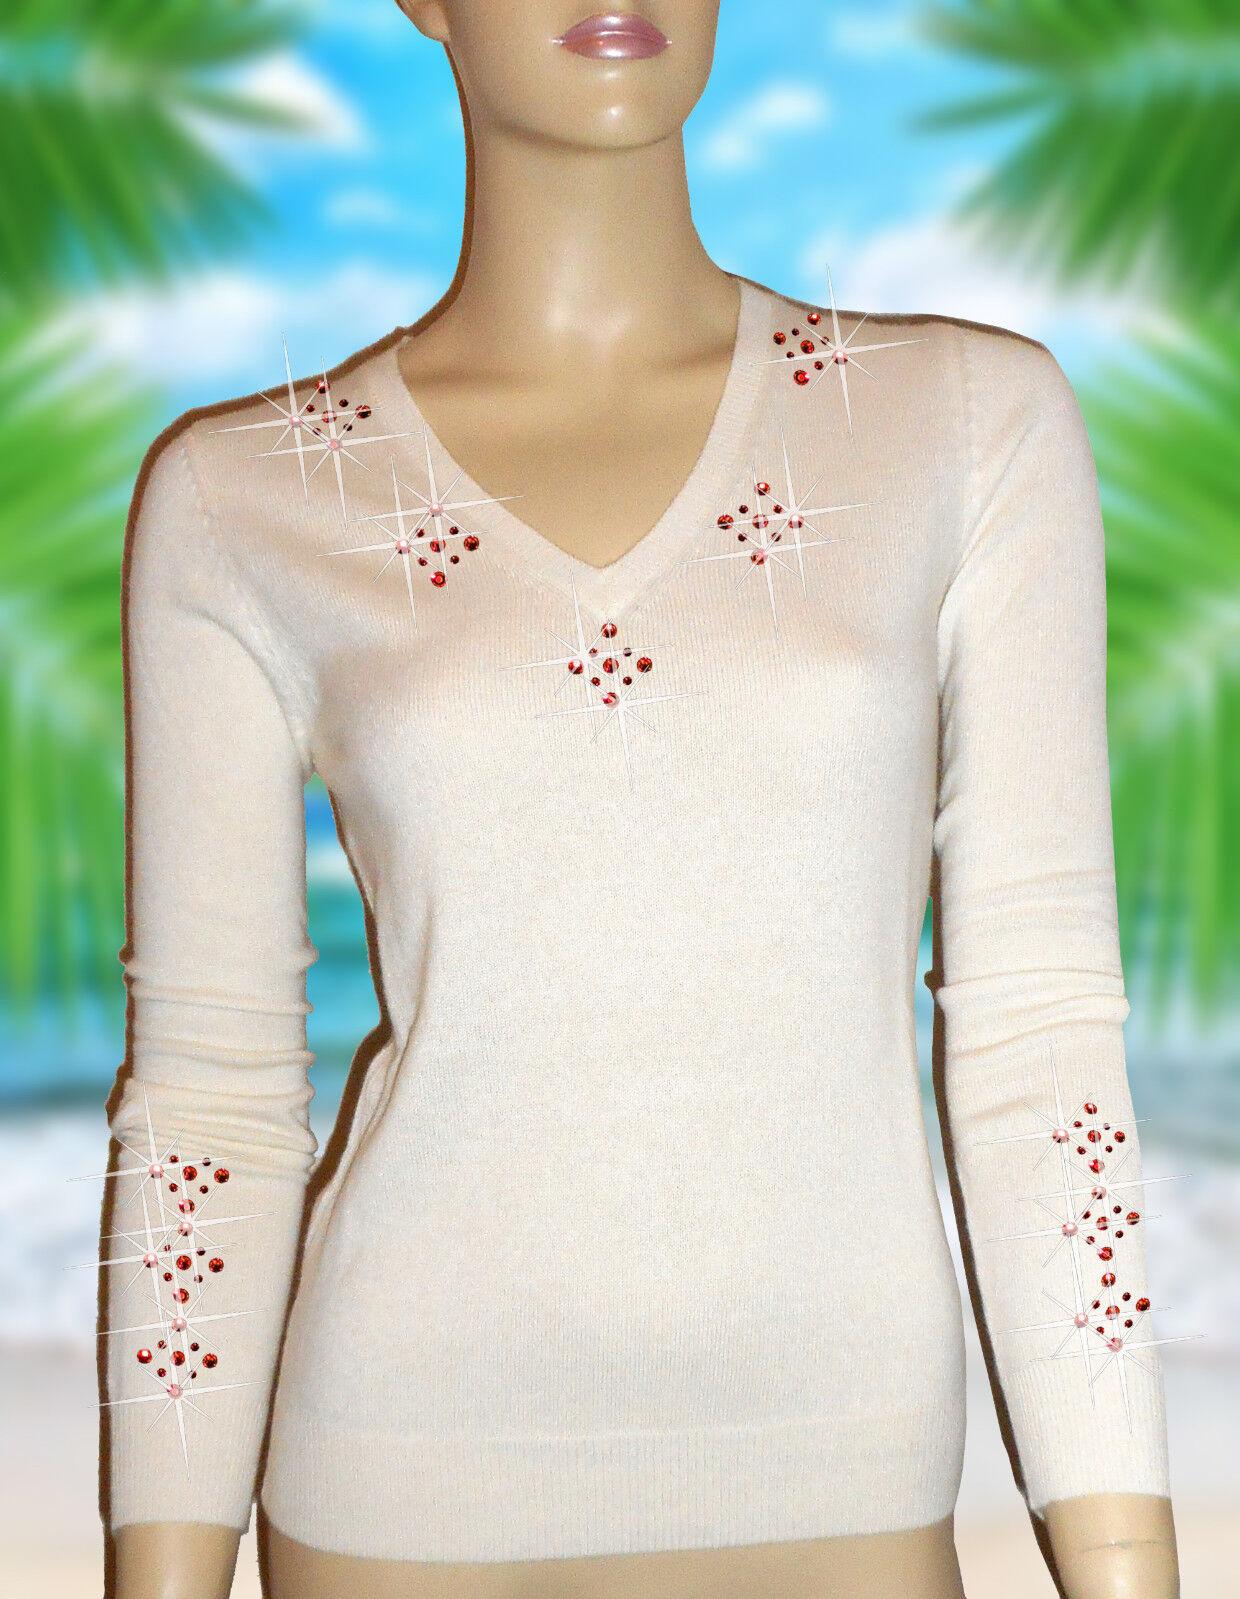 Luxe Oh ` Dor 100% Cashmere Pullover Lusso Bianco Bianco Bianco Rosso Cristalli 34 XS S 742f38